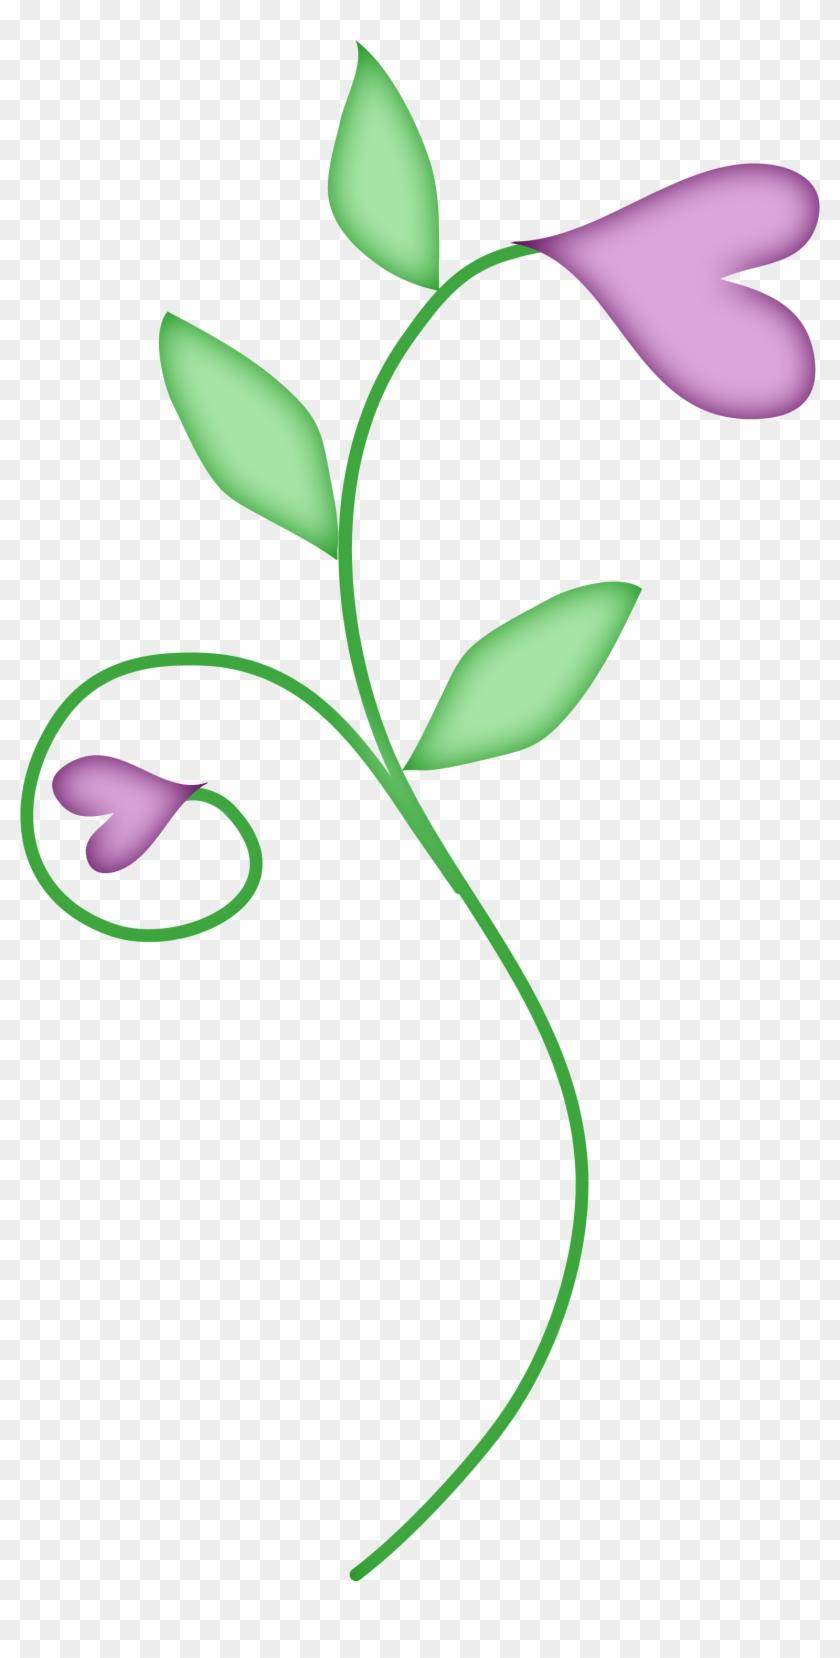 Spring Flower Clip Art - Clip Art #6261